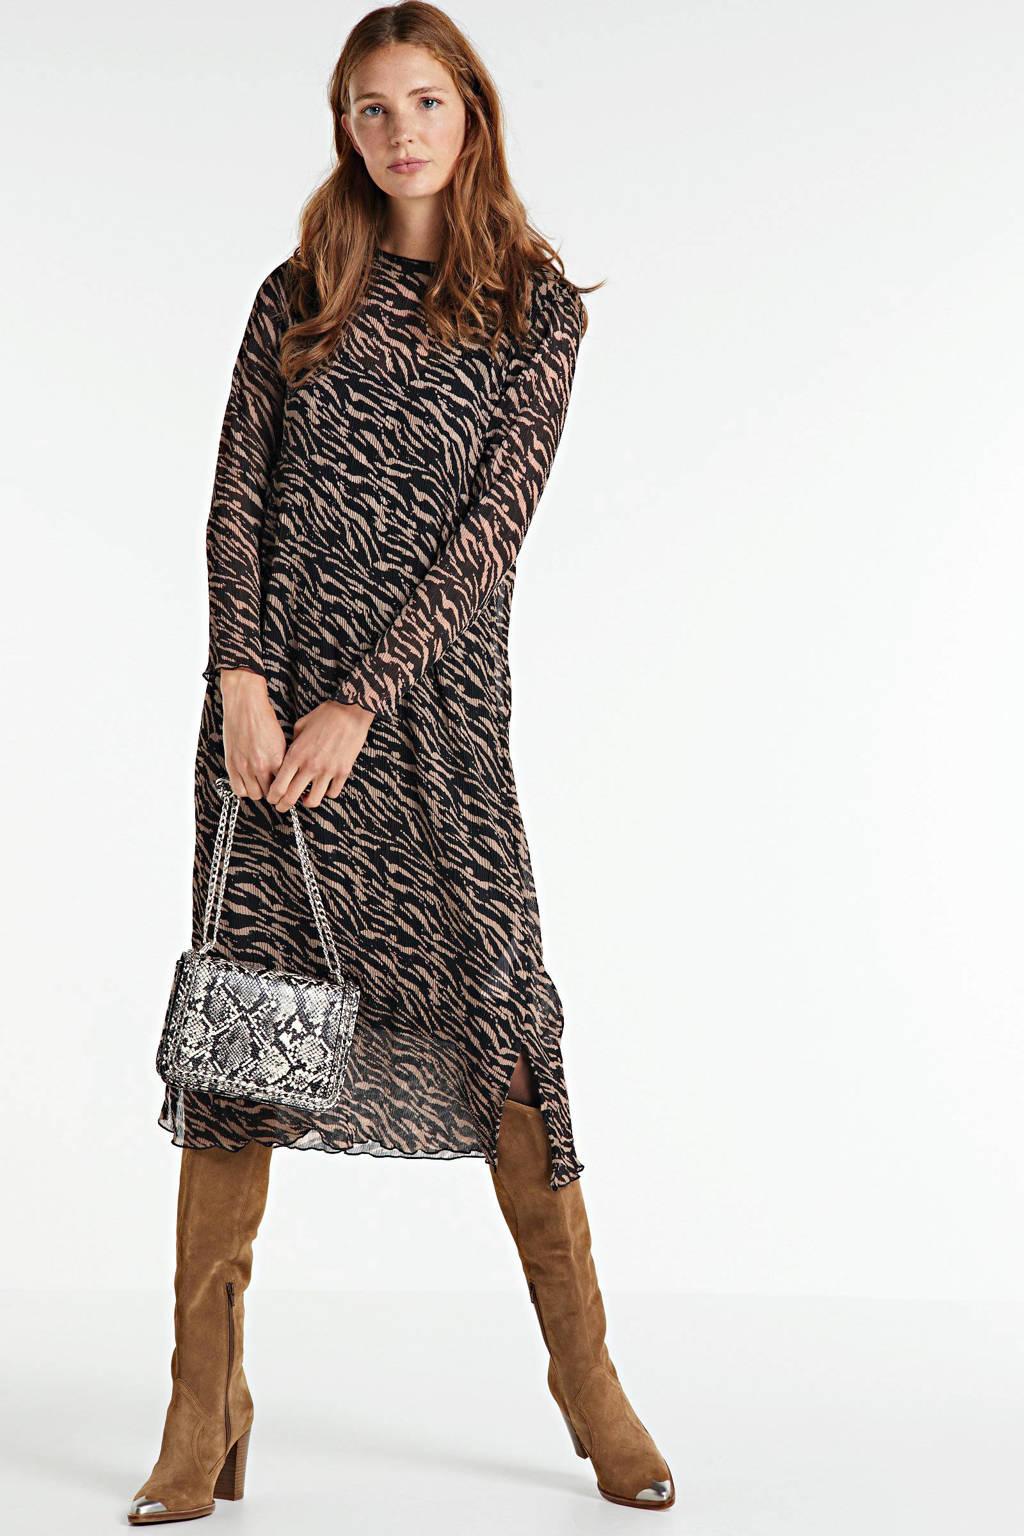 FREEQUENT semi-transparante jurk Edelyn met all over print bruin/zwart, Bruin/zwart